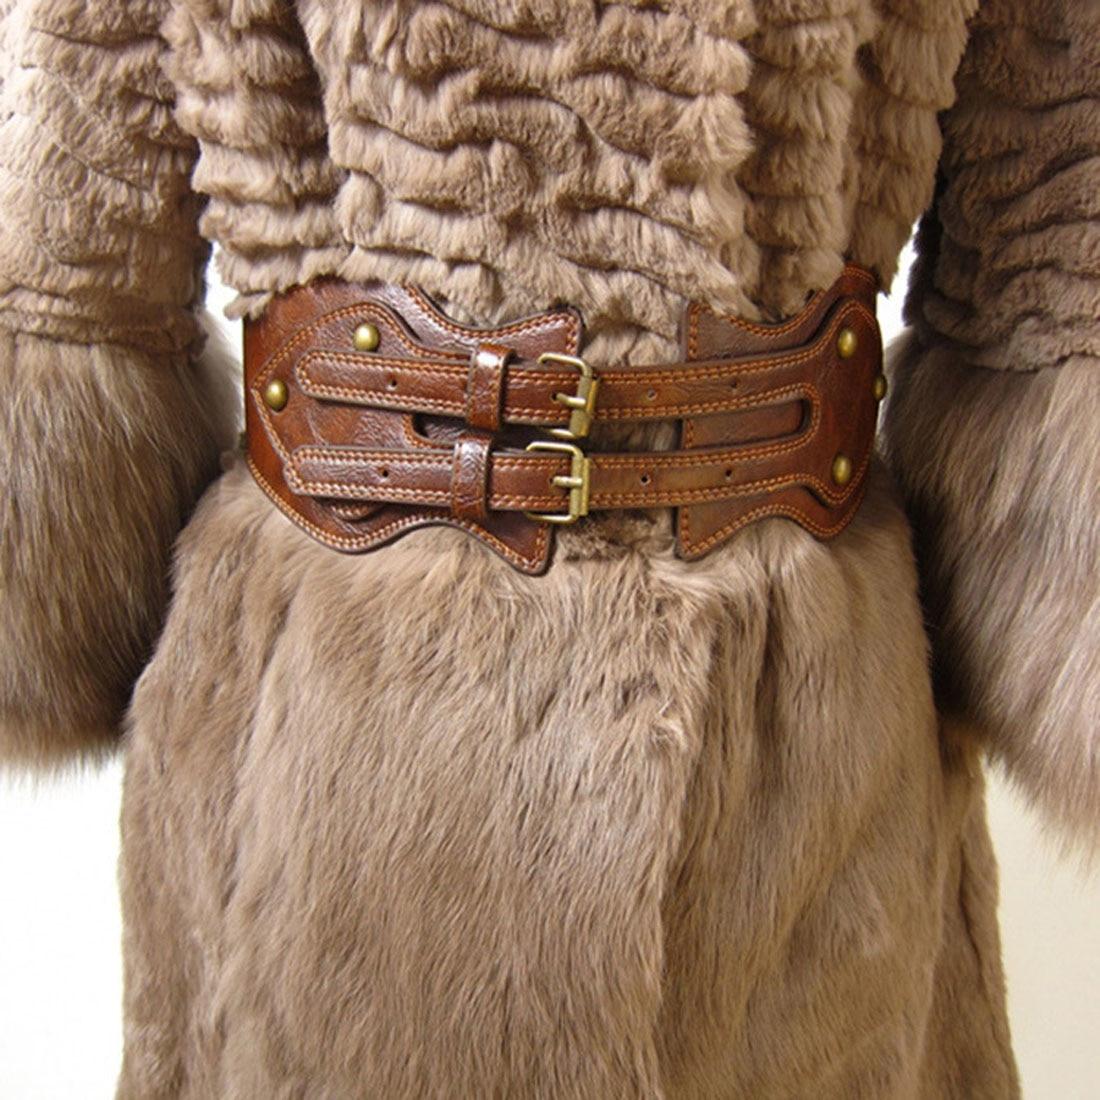 Vintage Dual Metal Needle Buckle Stylish Women Elastic Wide Belt Genuine Leather Waistband Cummerbund For Apparel Accessories